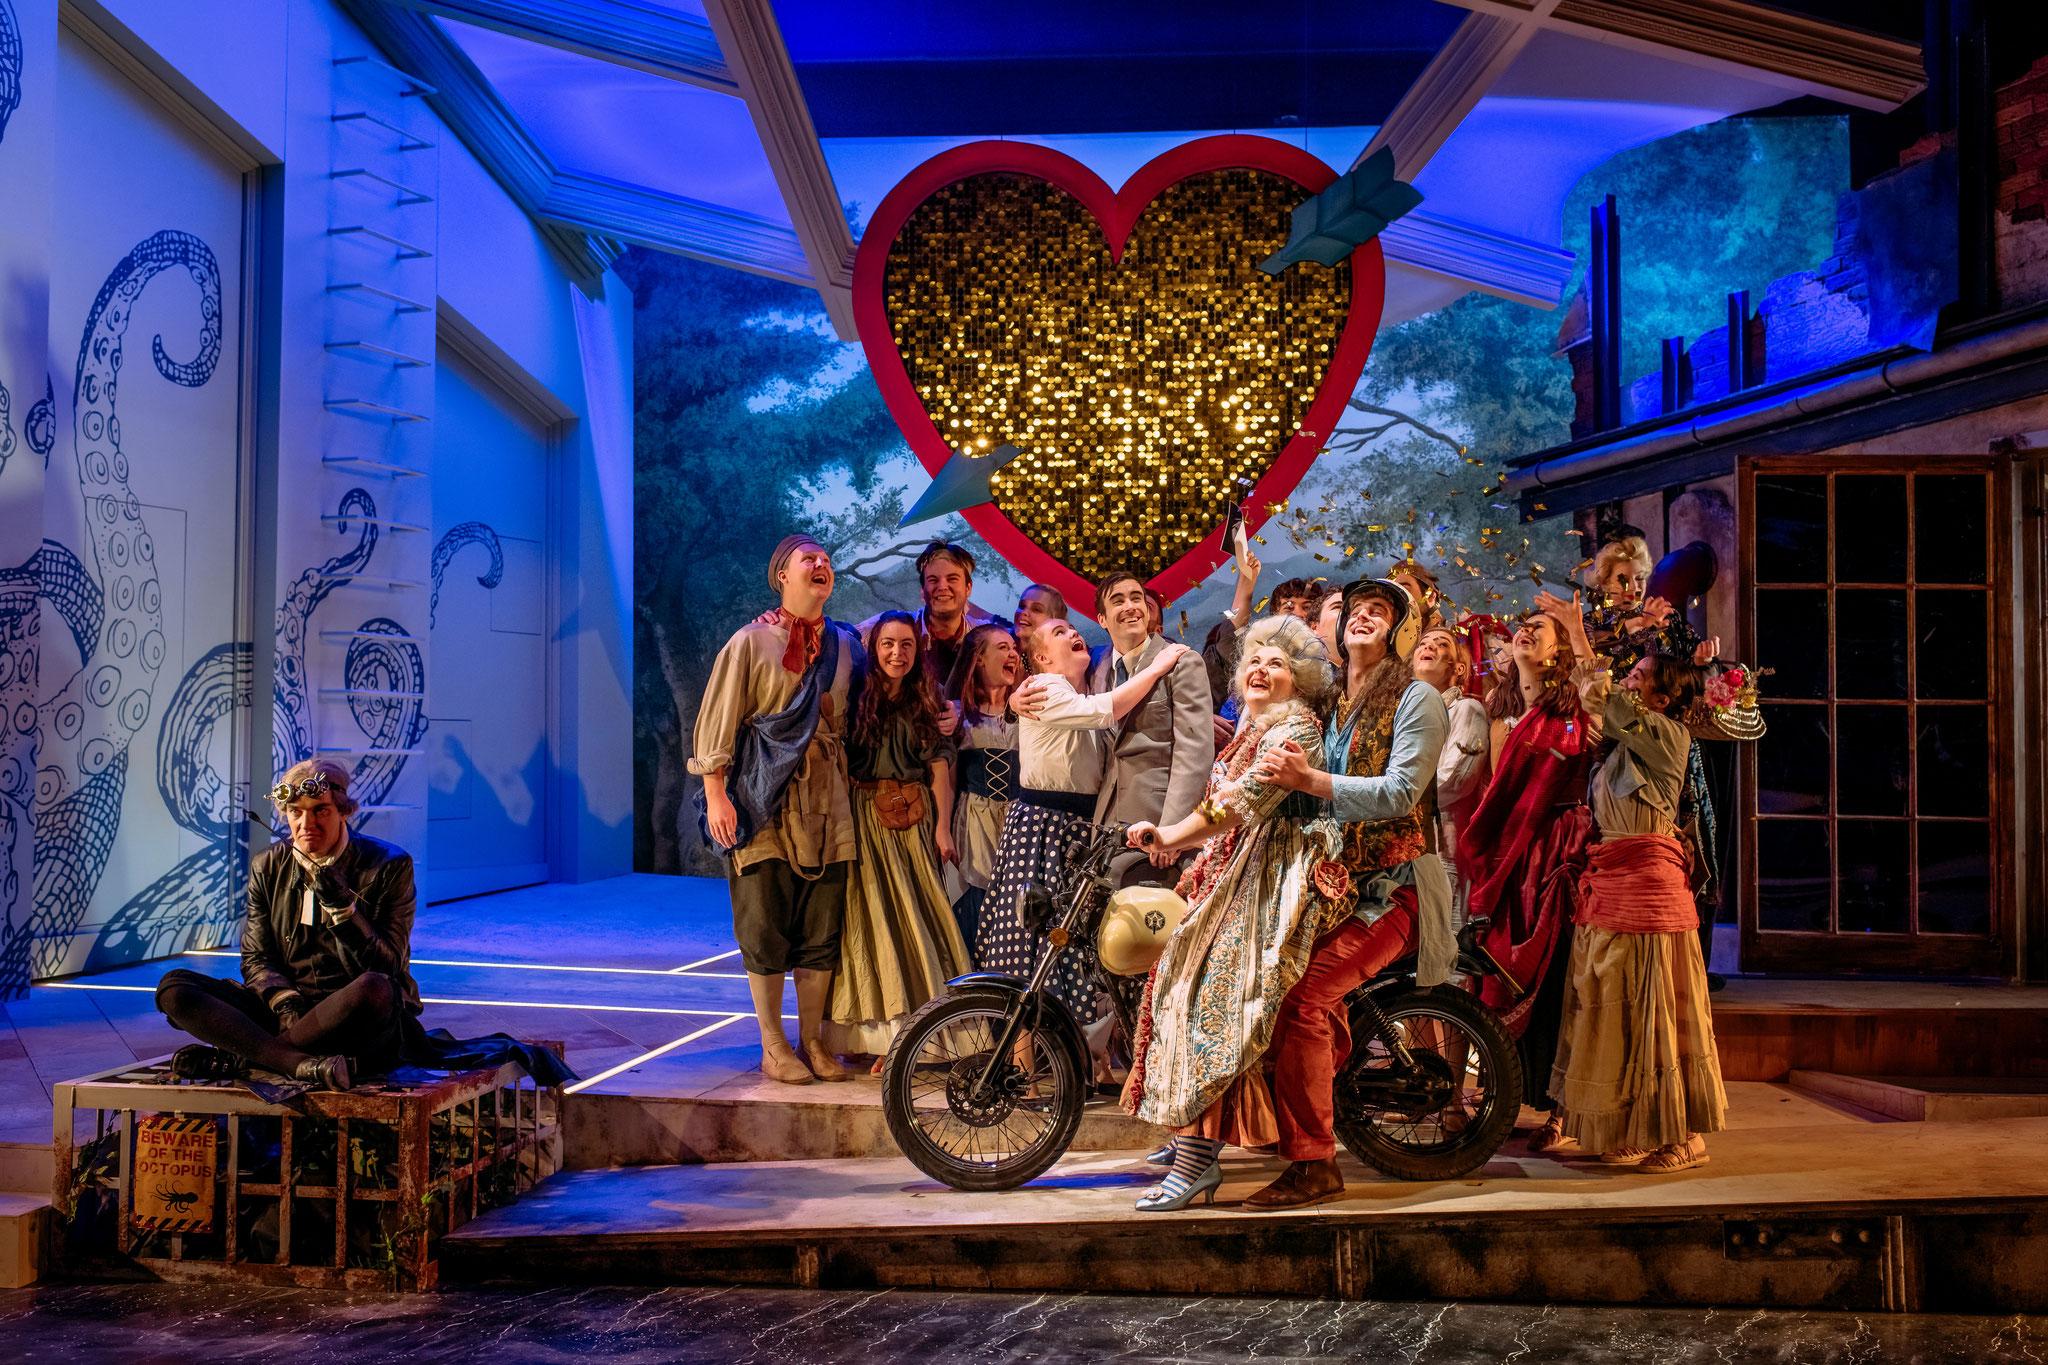 La fedeltà premiata: Guildhall Opera November 2019 - Photo courtesy of Mihaela Bodlovic